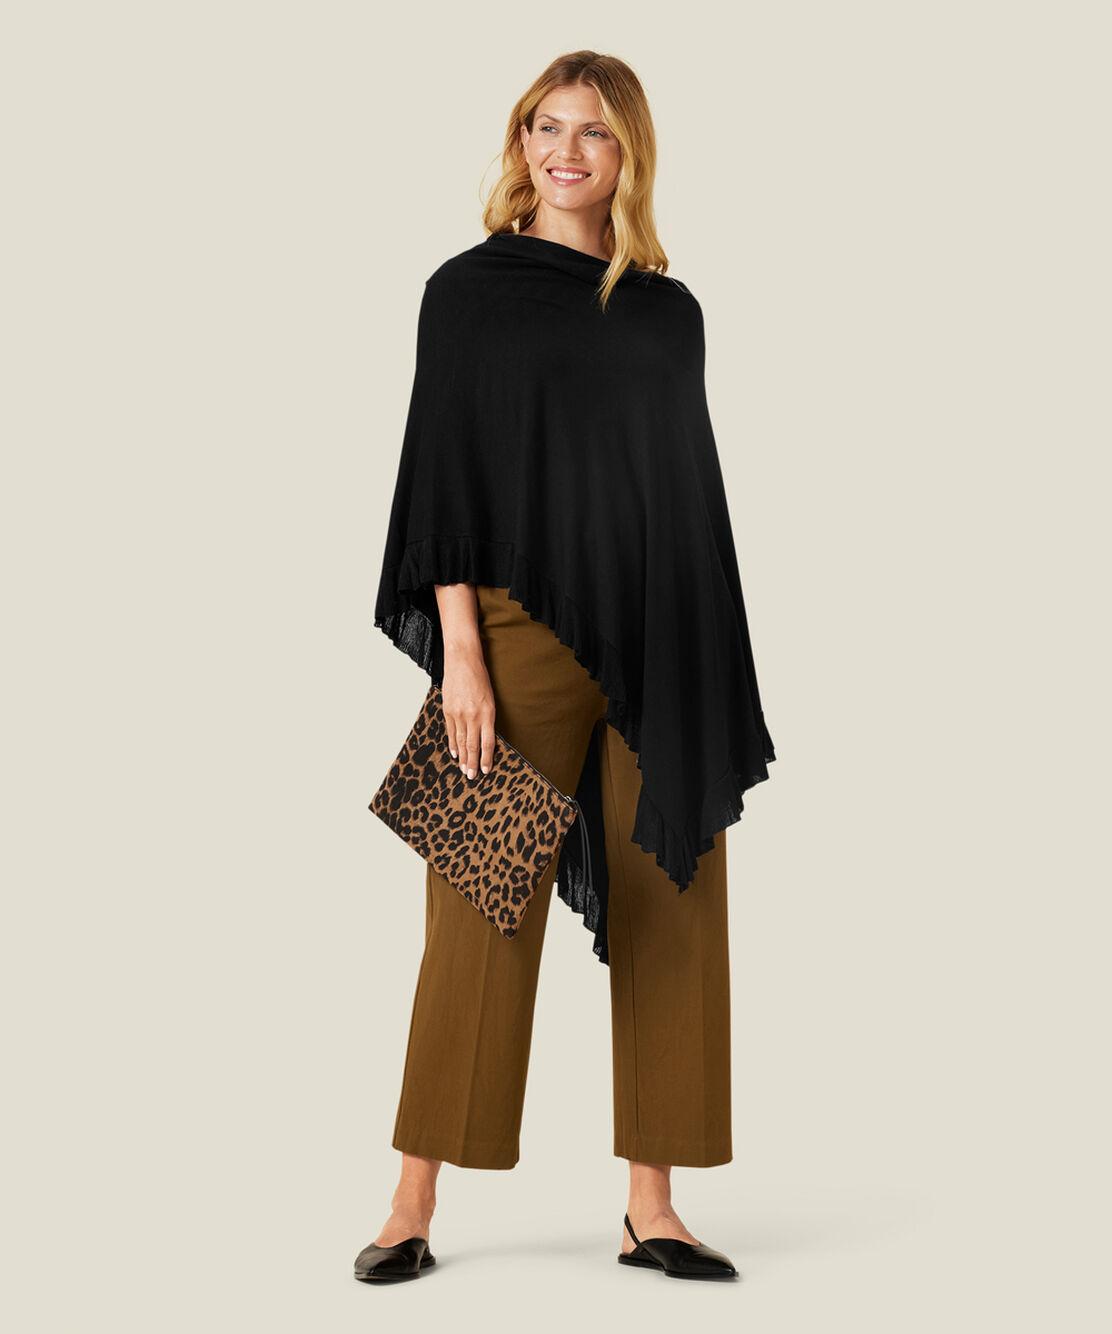 PETIA BUKSER, Monk's Robe, hi-res